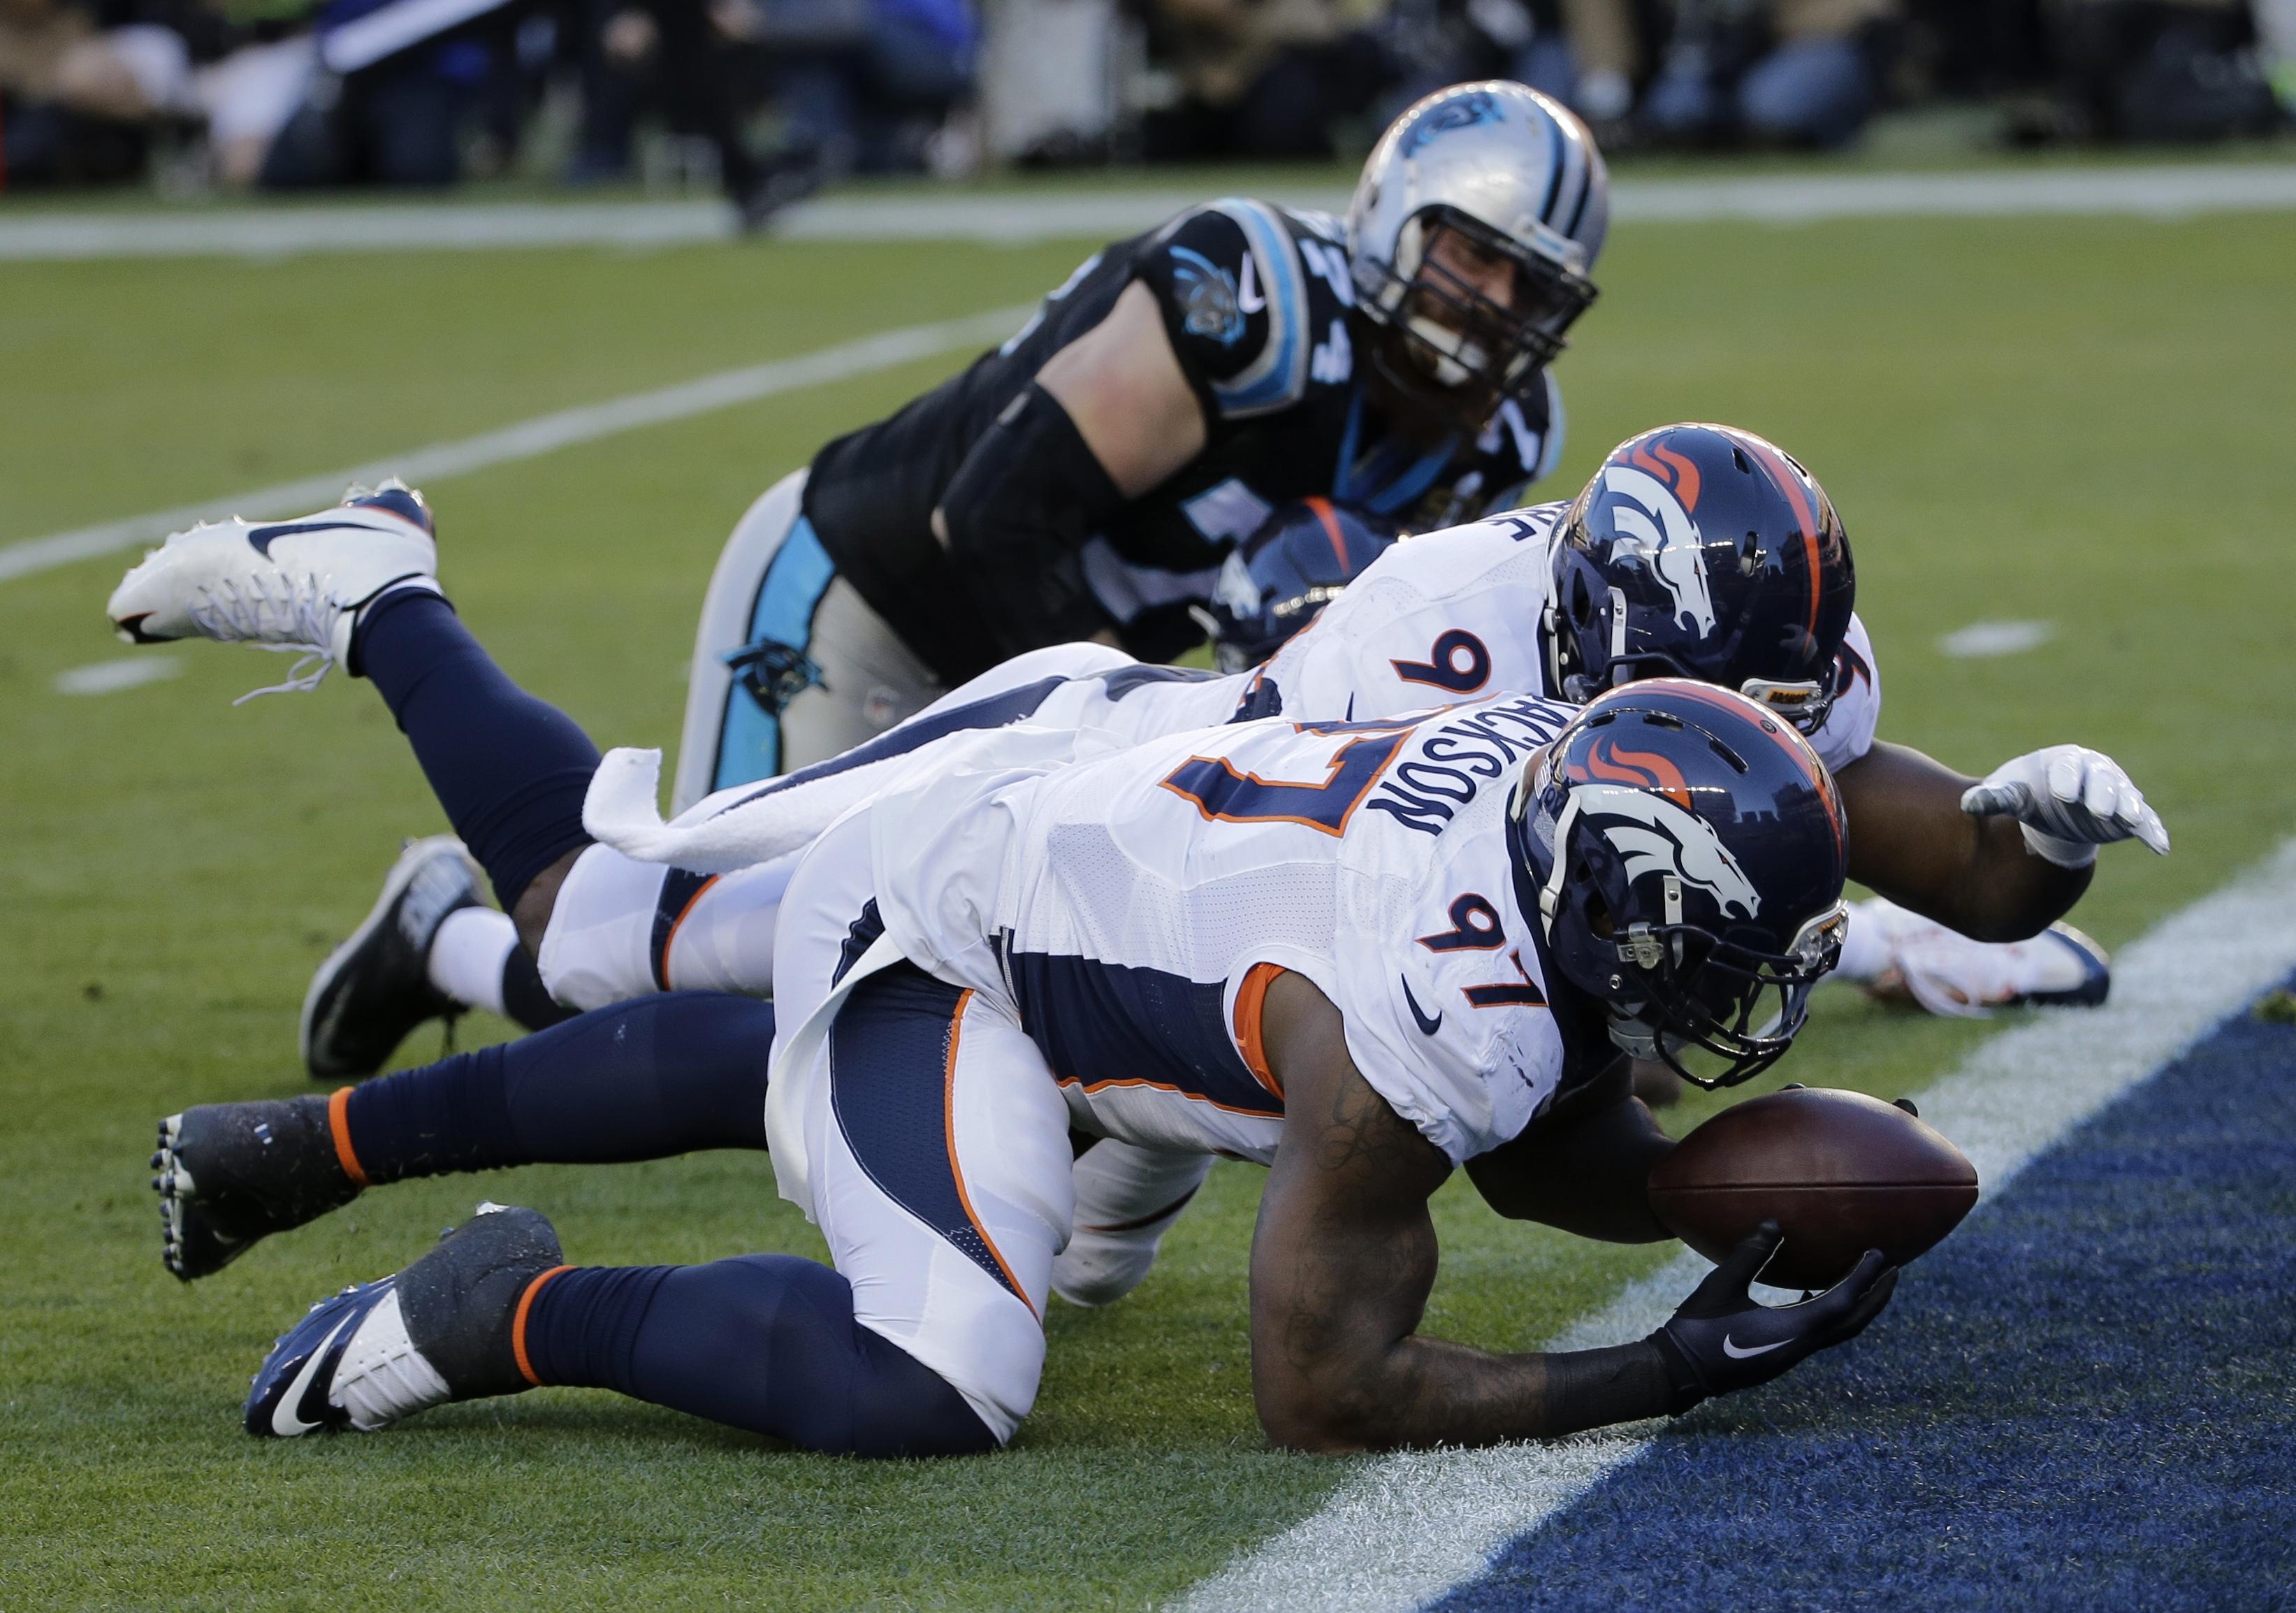 Photo: Denver Broncos' Malik Jackson recovers a fumble, Super Bowl 50 (AP2)